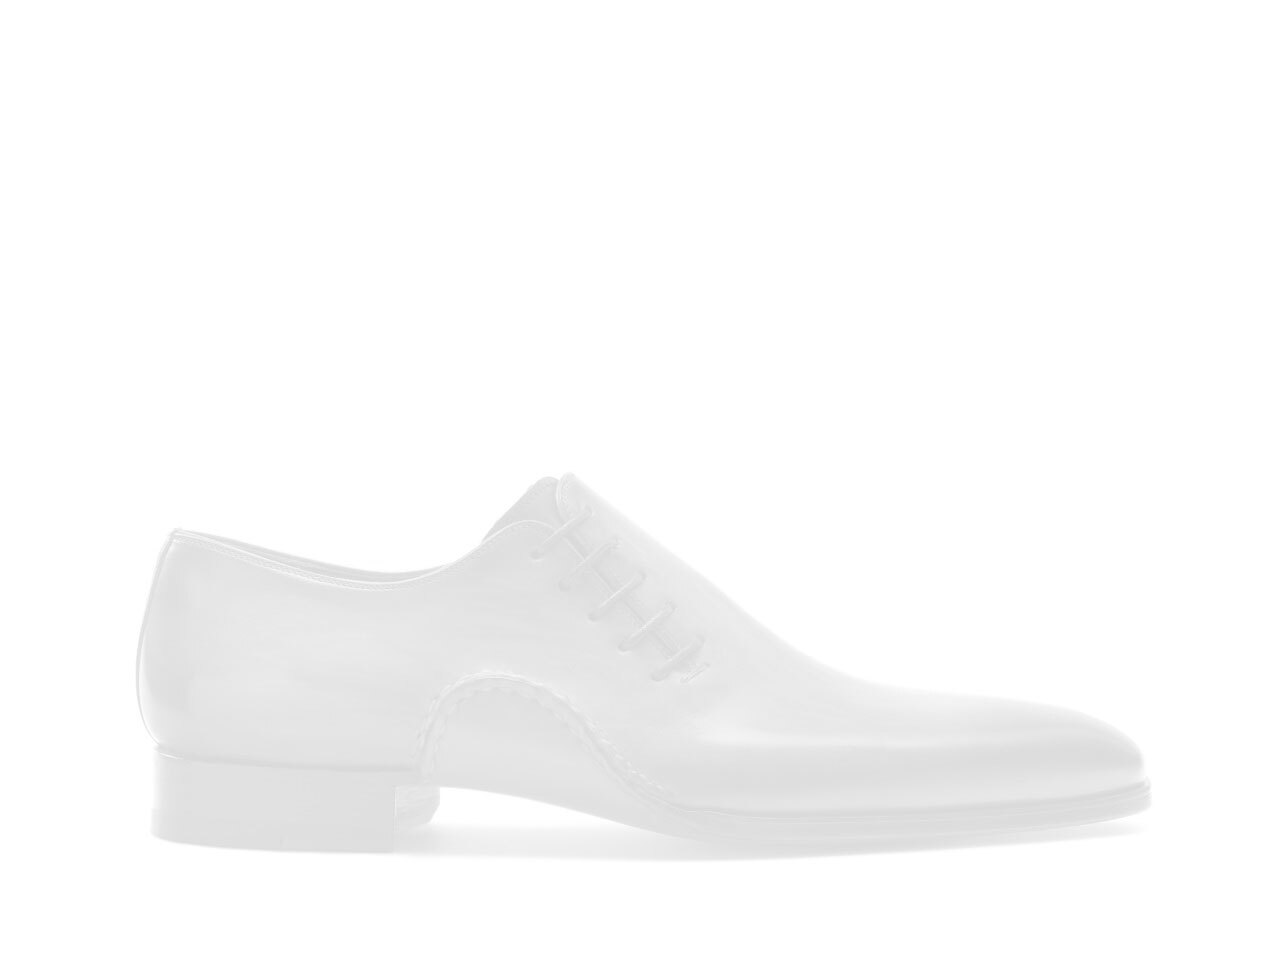 Pair of the Magnanni Garrett II Jean Suede Men's Double Monk Strap Shoes